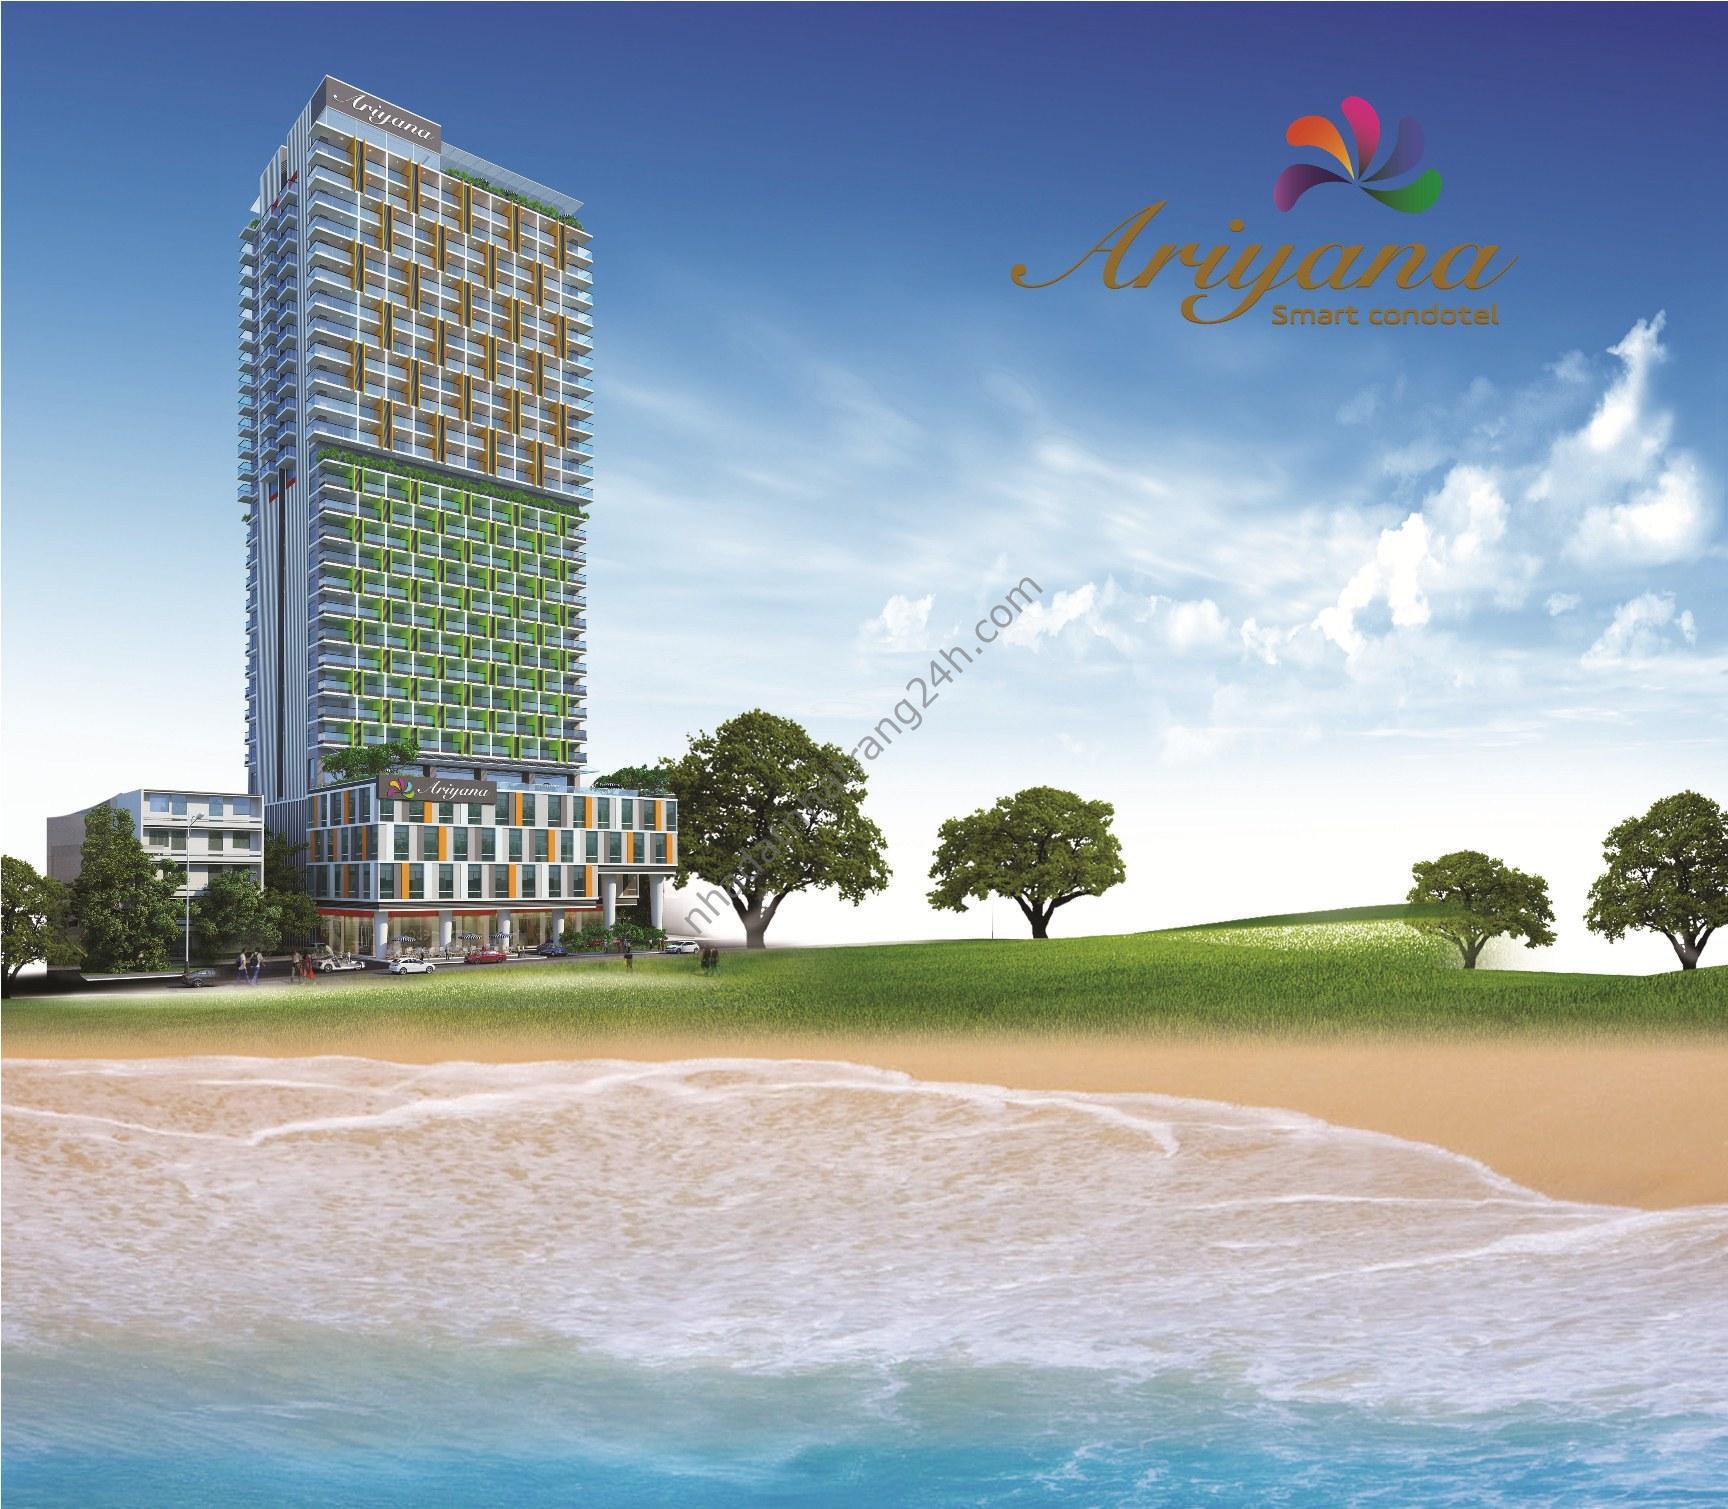 ariyana-smart-condotel-nha-trang-1-1478682406